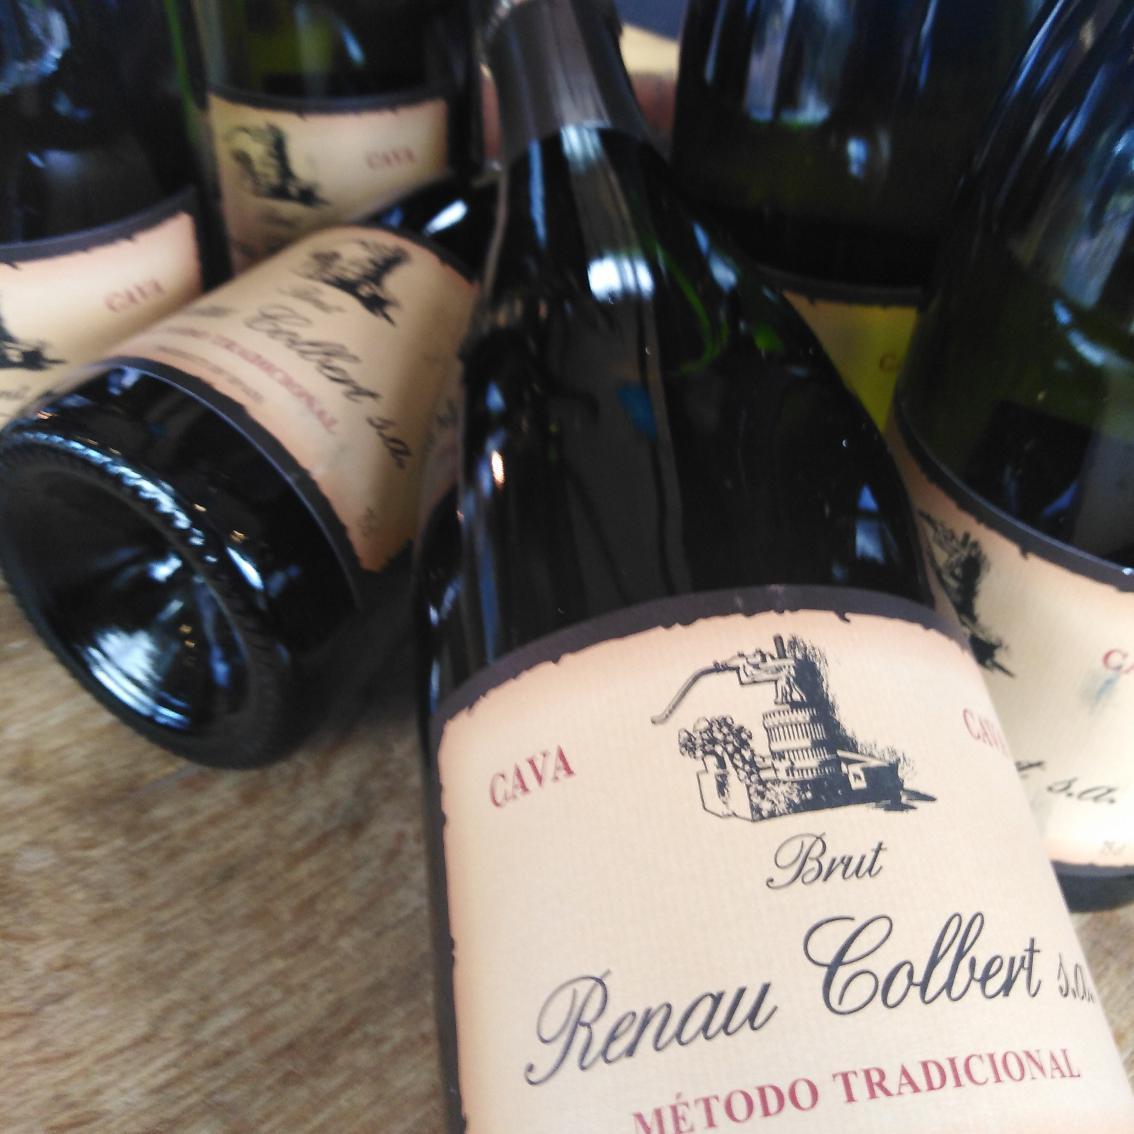 6 flasker Cava Brut - Renau Colbert